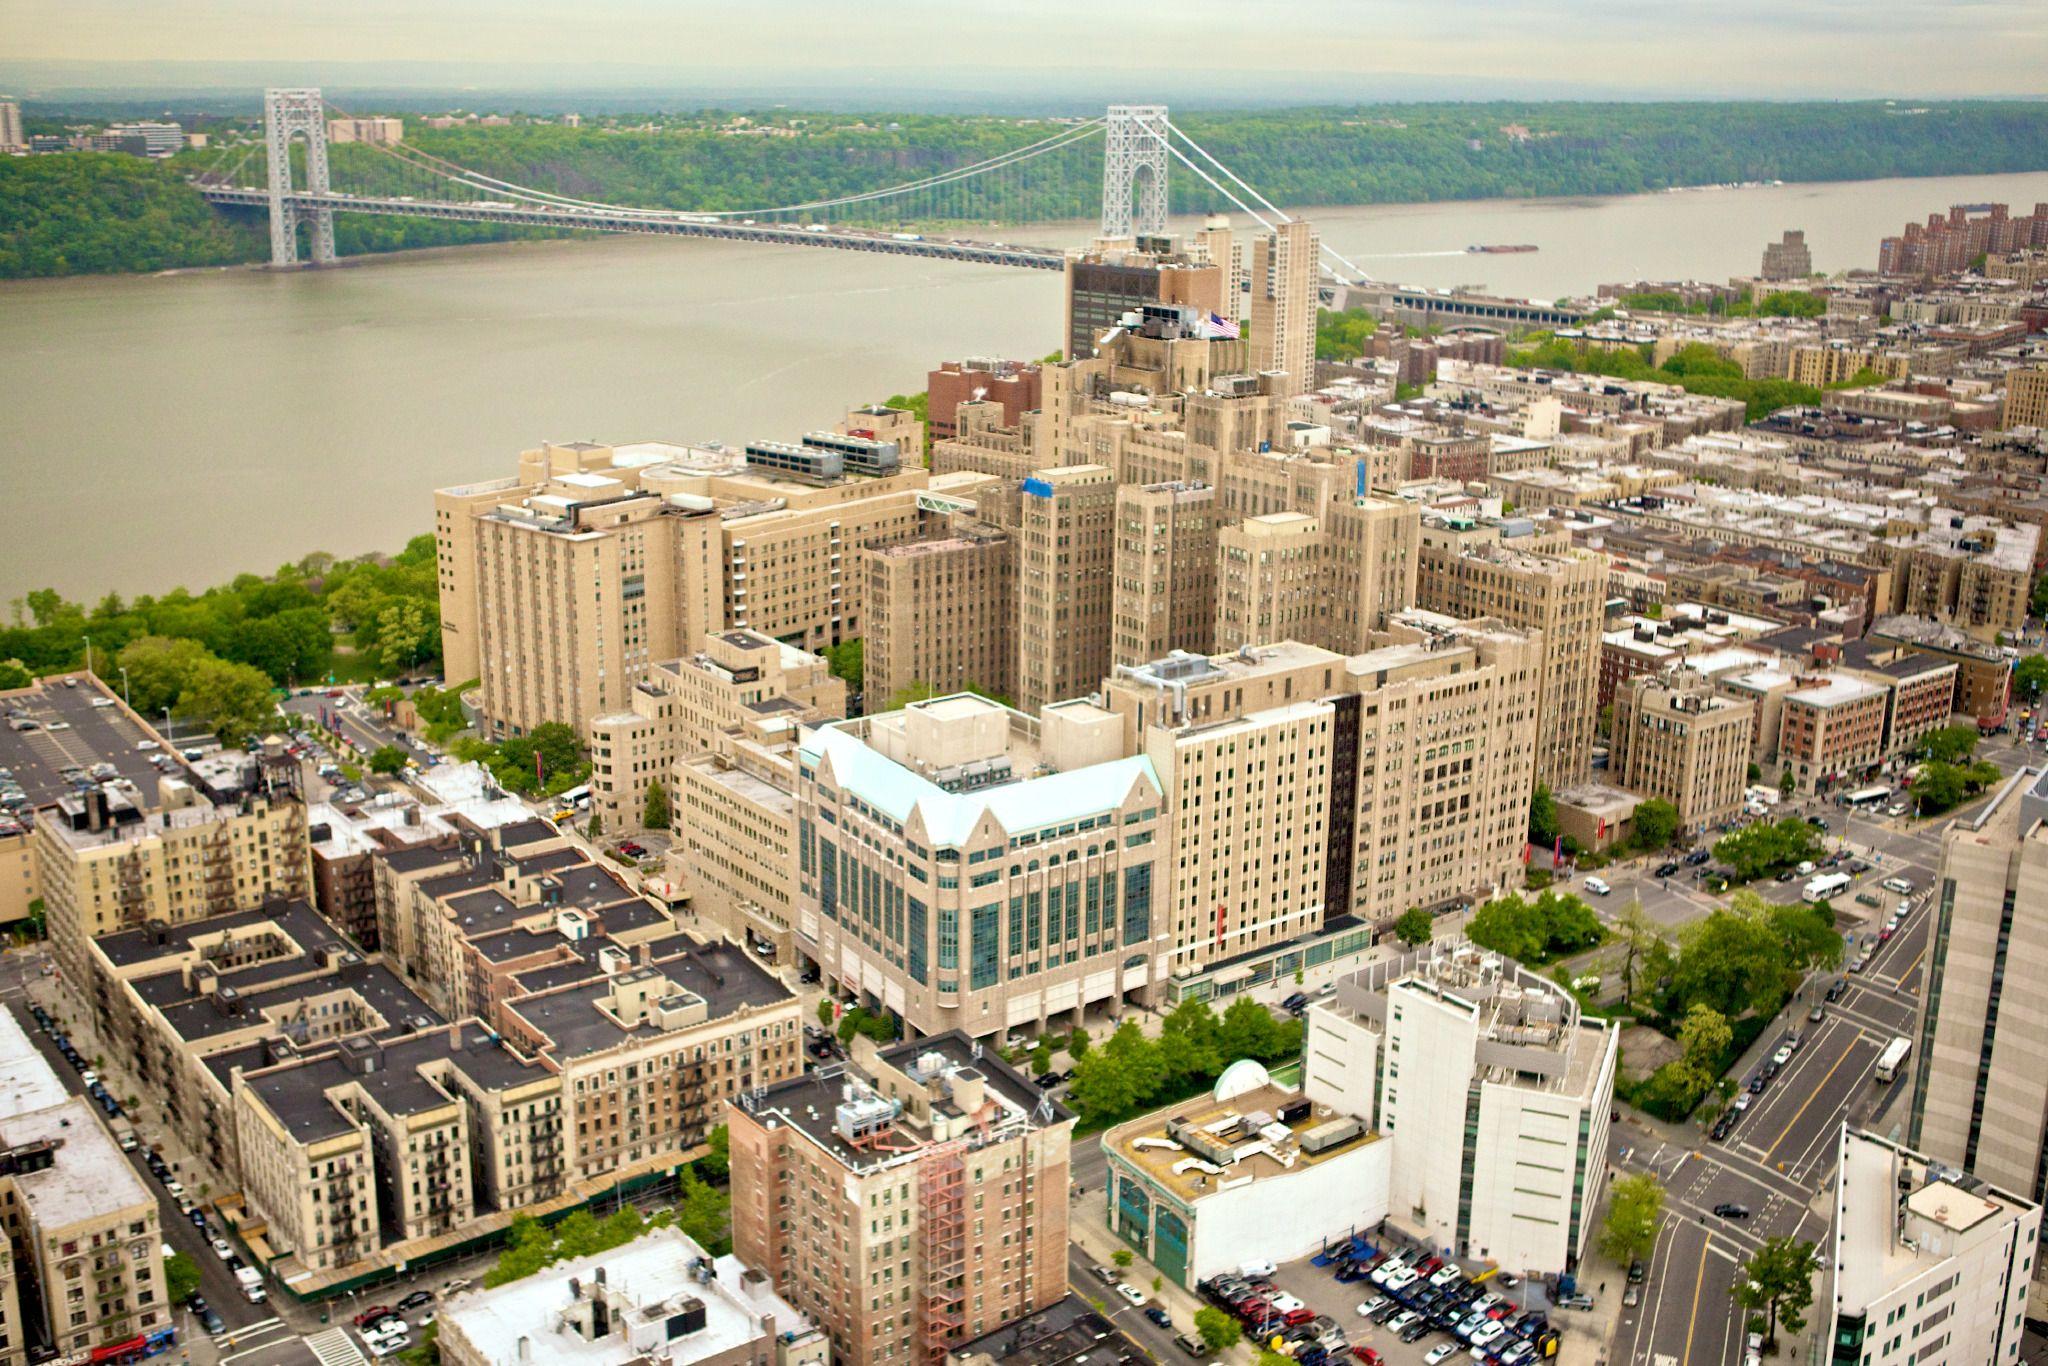 Columbia university medical center partially manhatten